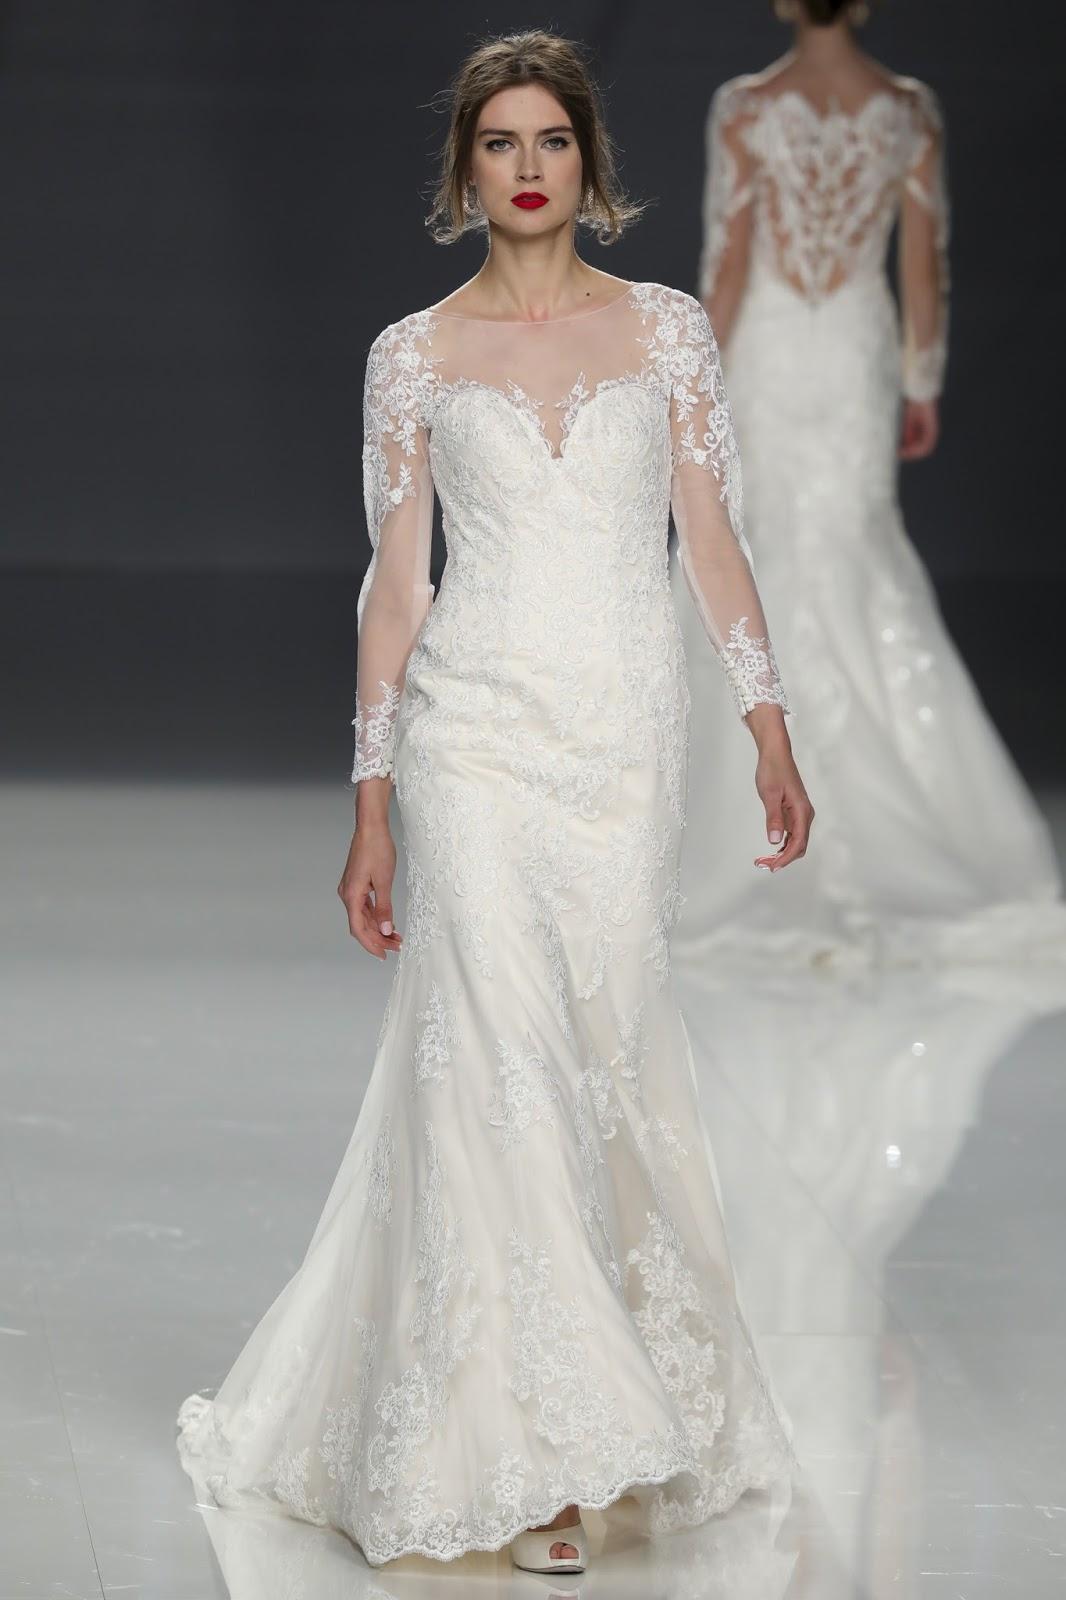 Demetrios Wedding Dress Prices 19 Elegant DEMETRIOS SPRING BRIDAL COLLECTION